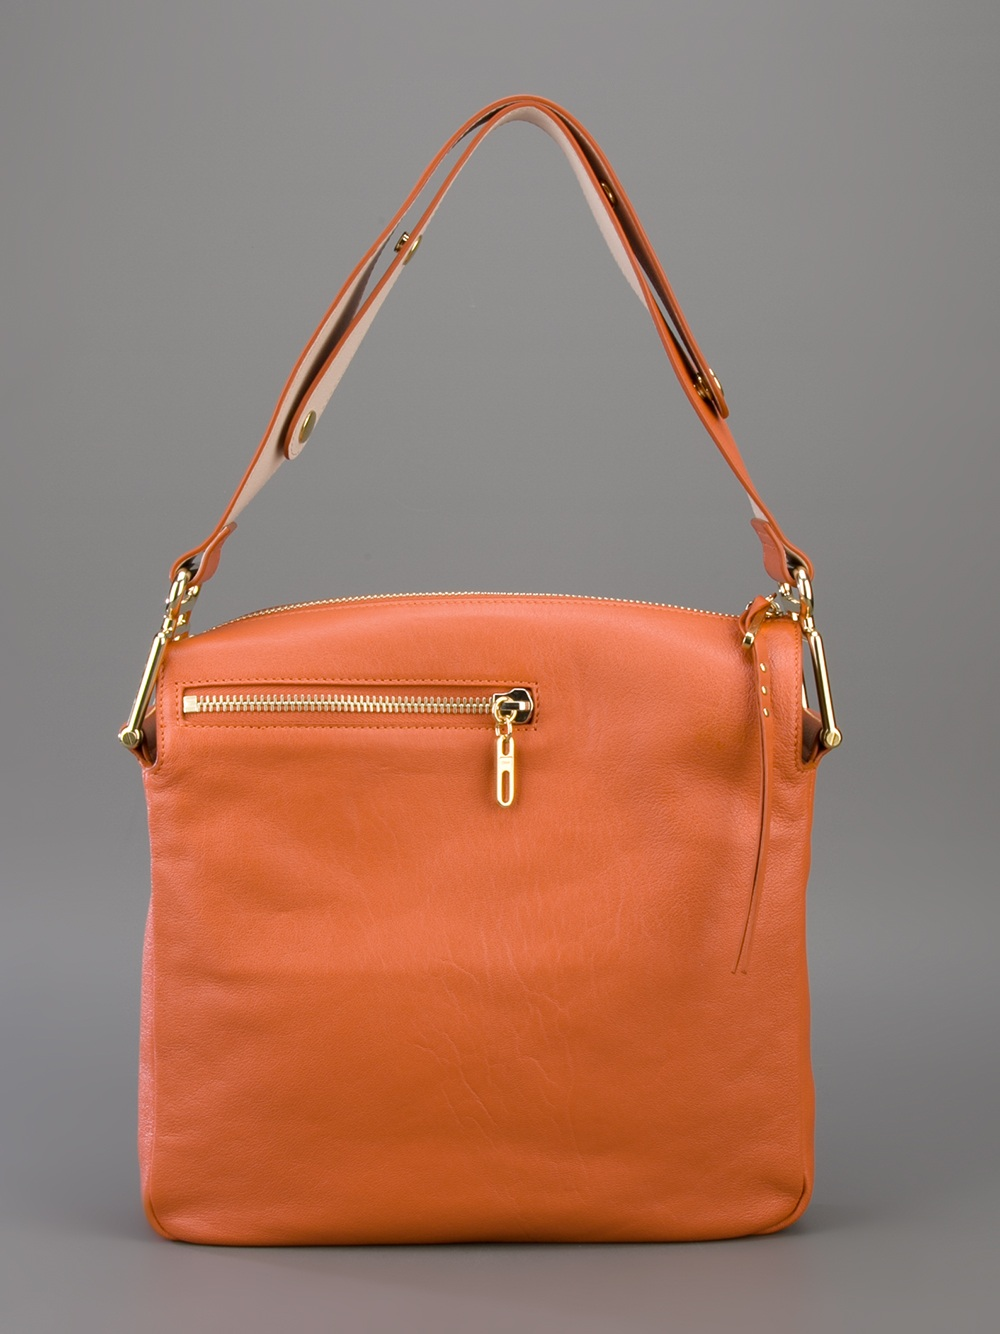 Chloé Vanessa Crossbody Bag in Yellow & Orange (Orange)